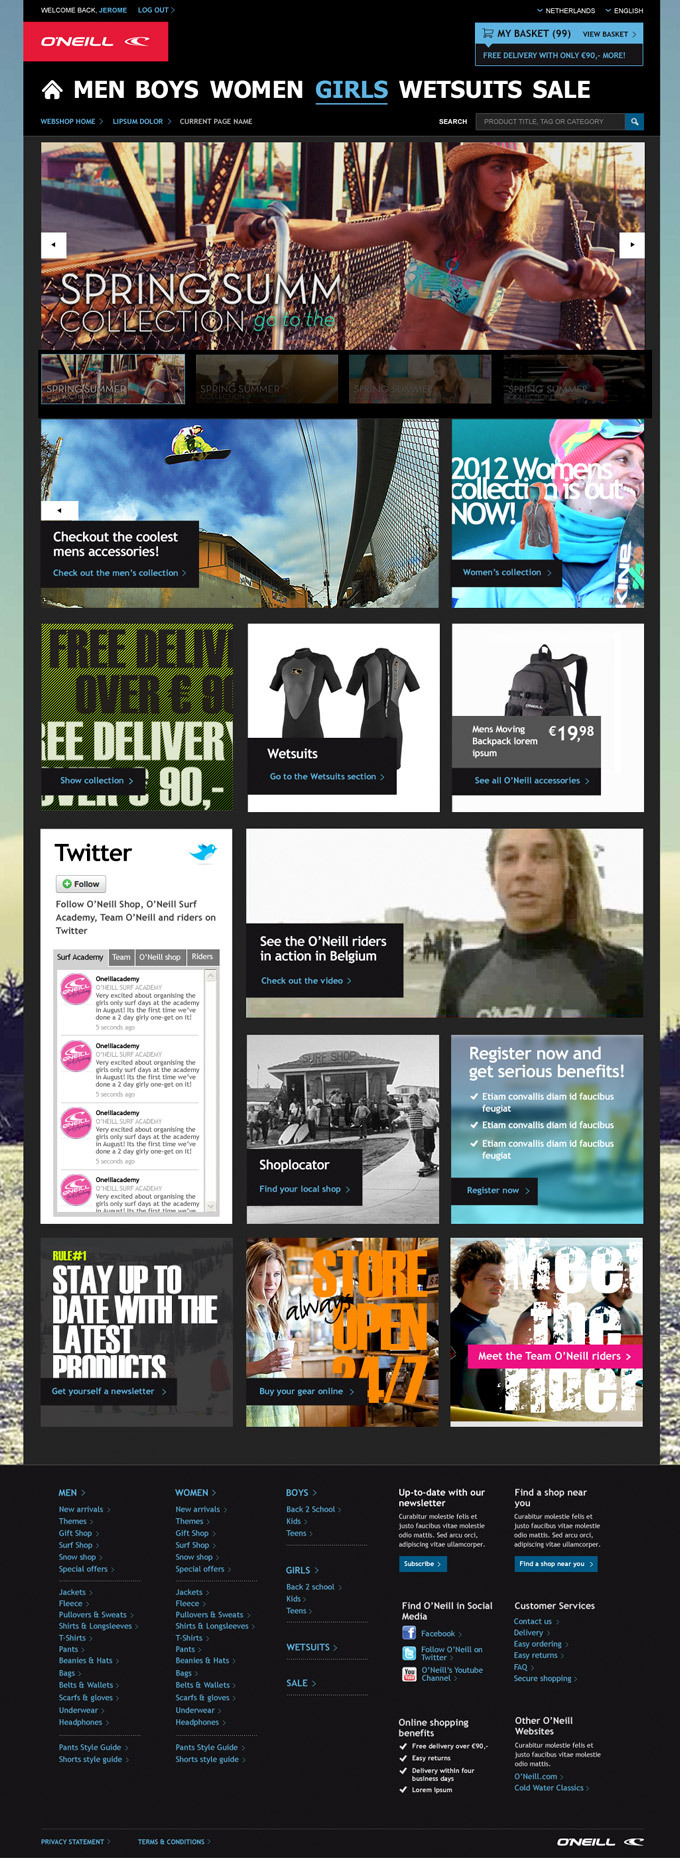 Afbeelding 1 van 7 - O'Neill global webshop re-design - Homepage en algehele stijl variant 1